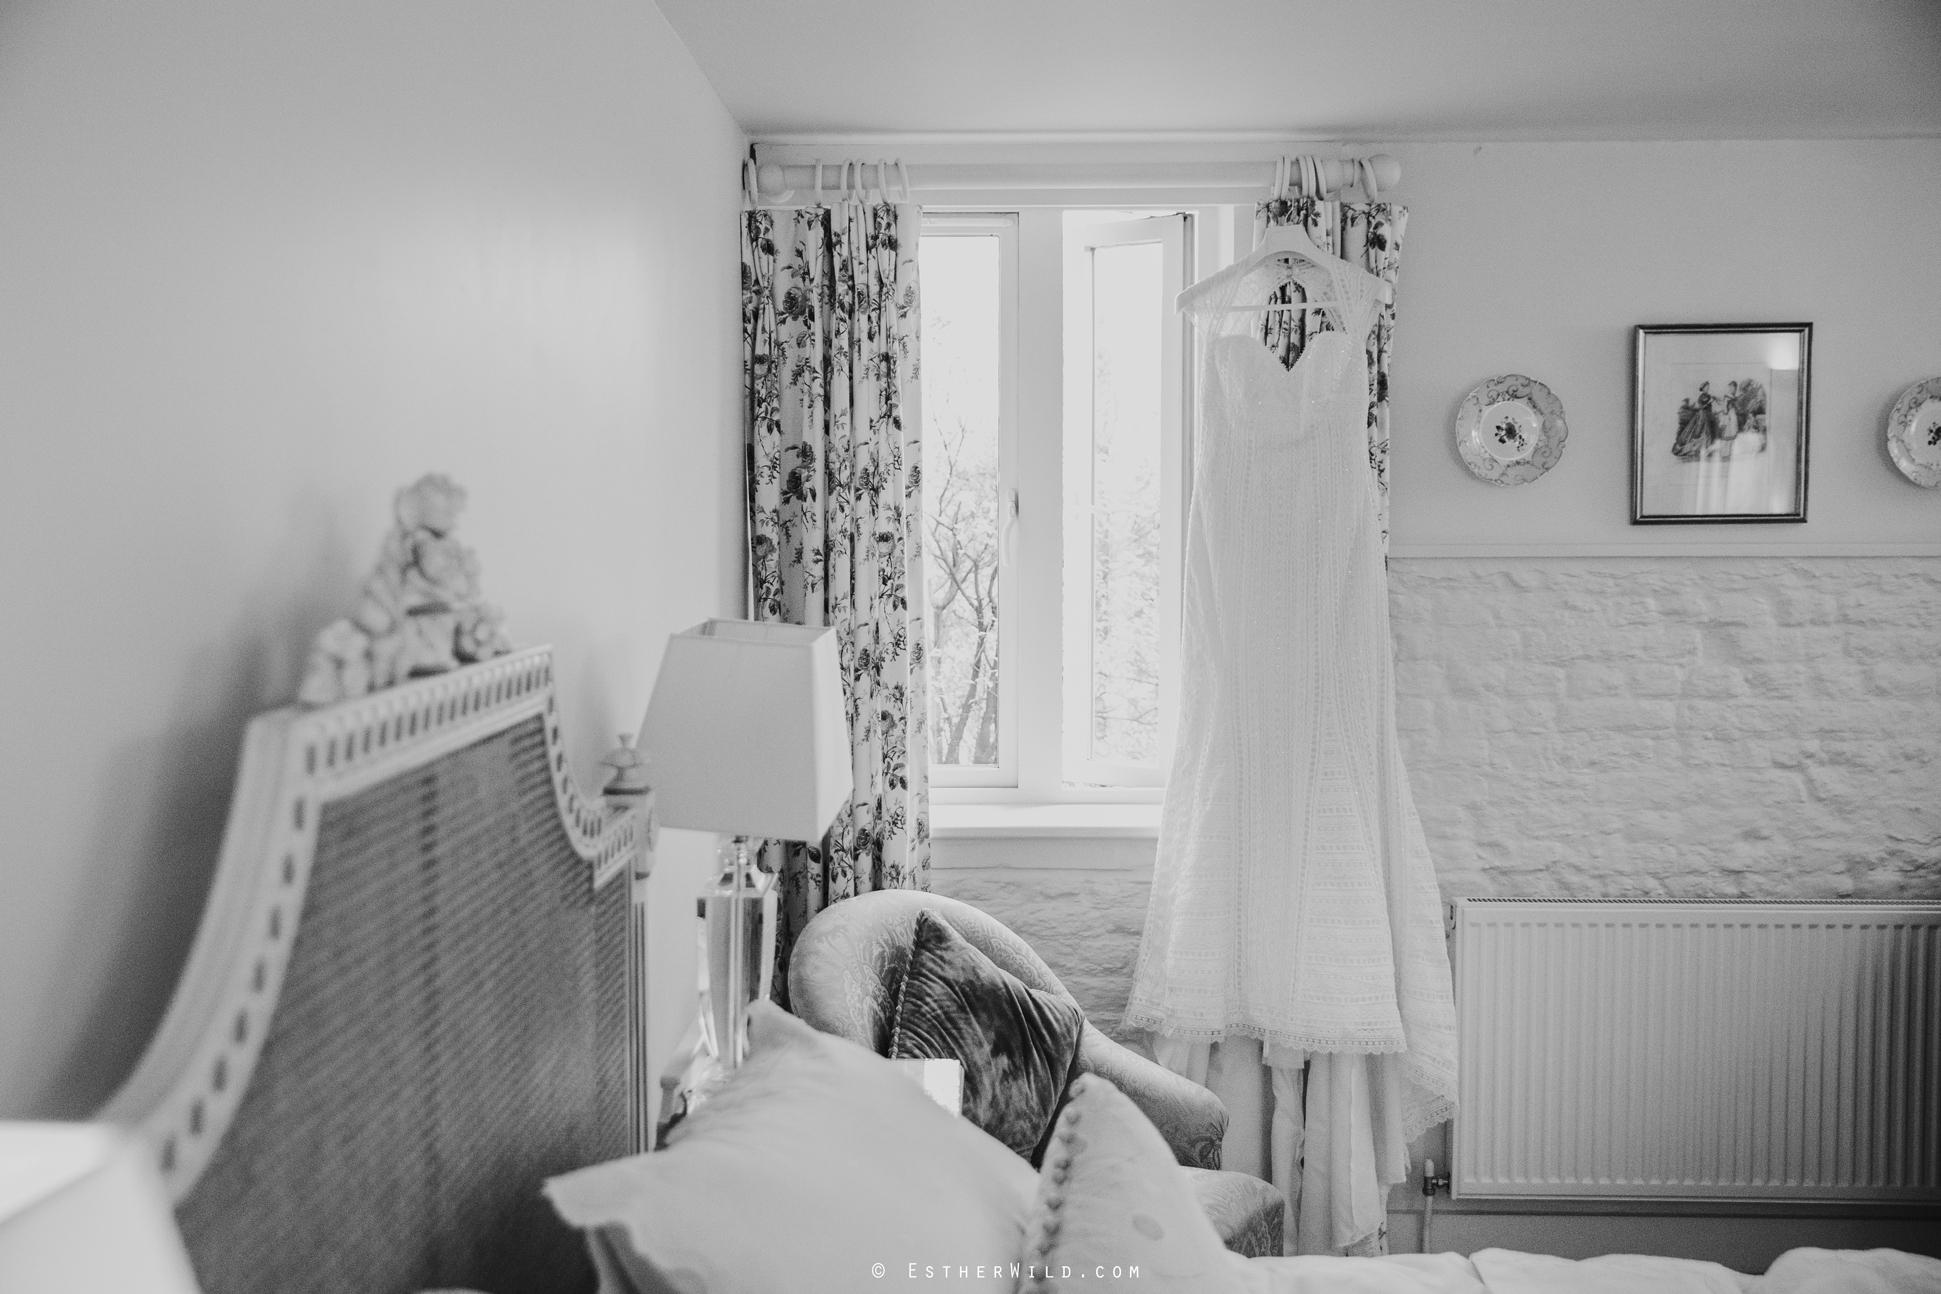 Elms_Barn_Weddings_Suffolk_Photographer_Copyright_Esther_Wild_IMG_0007-2.jpg